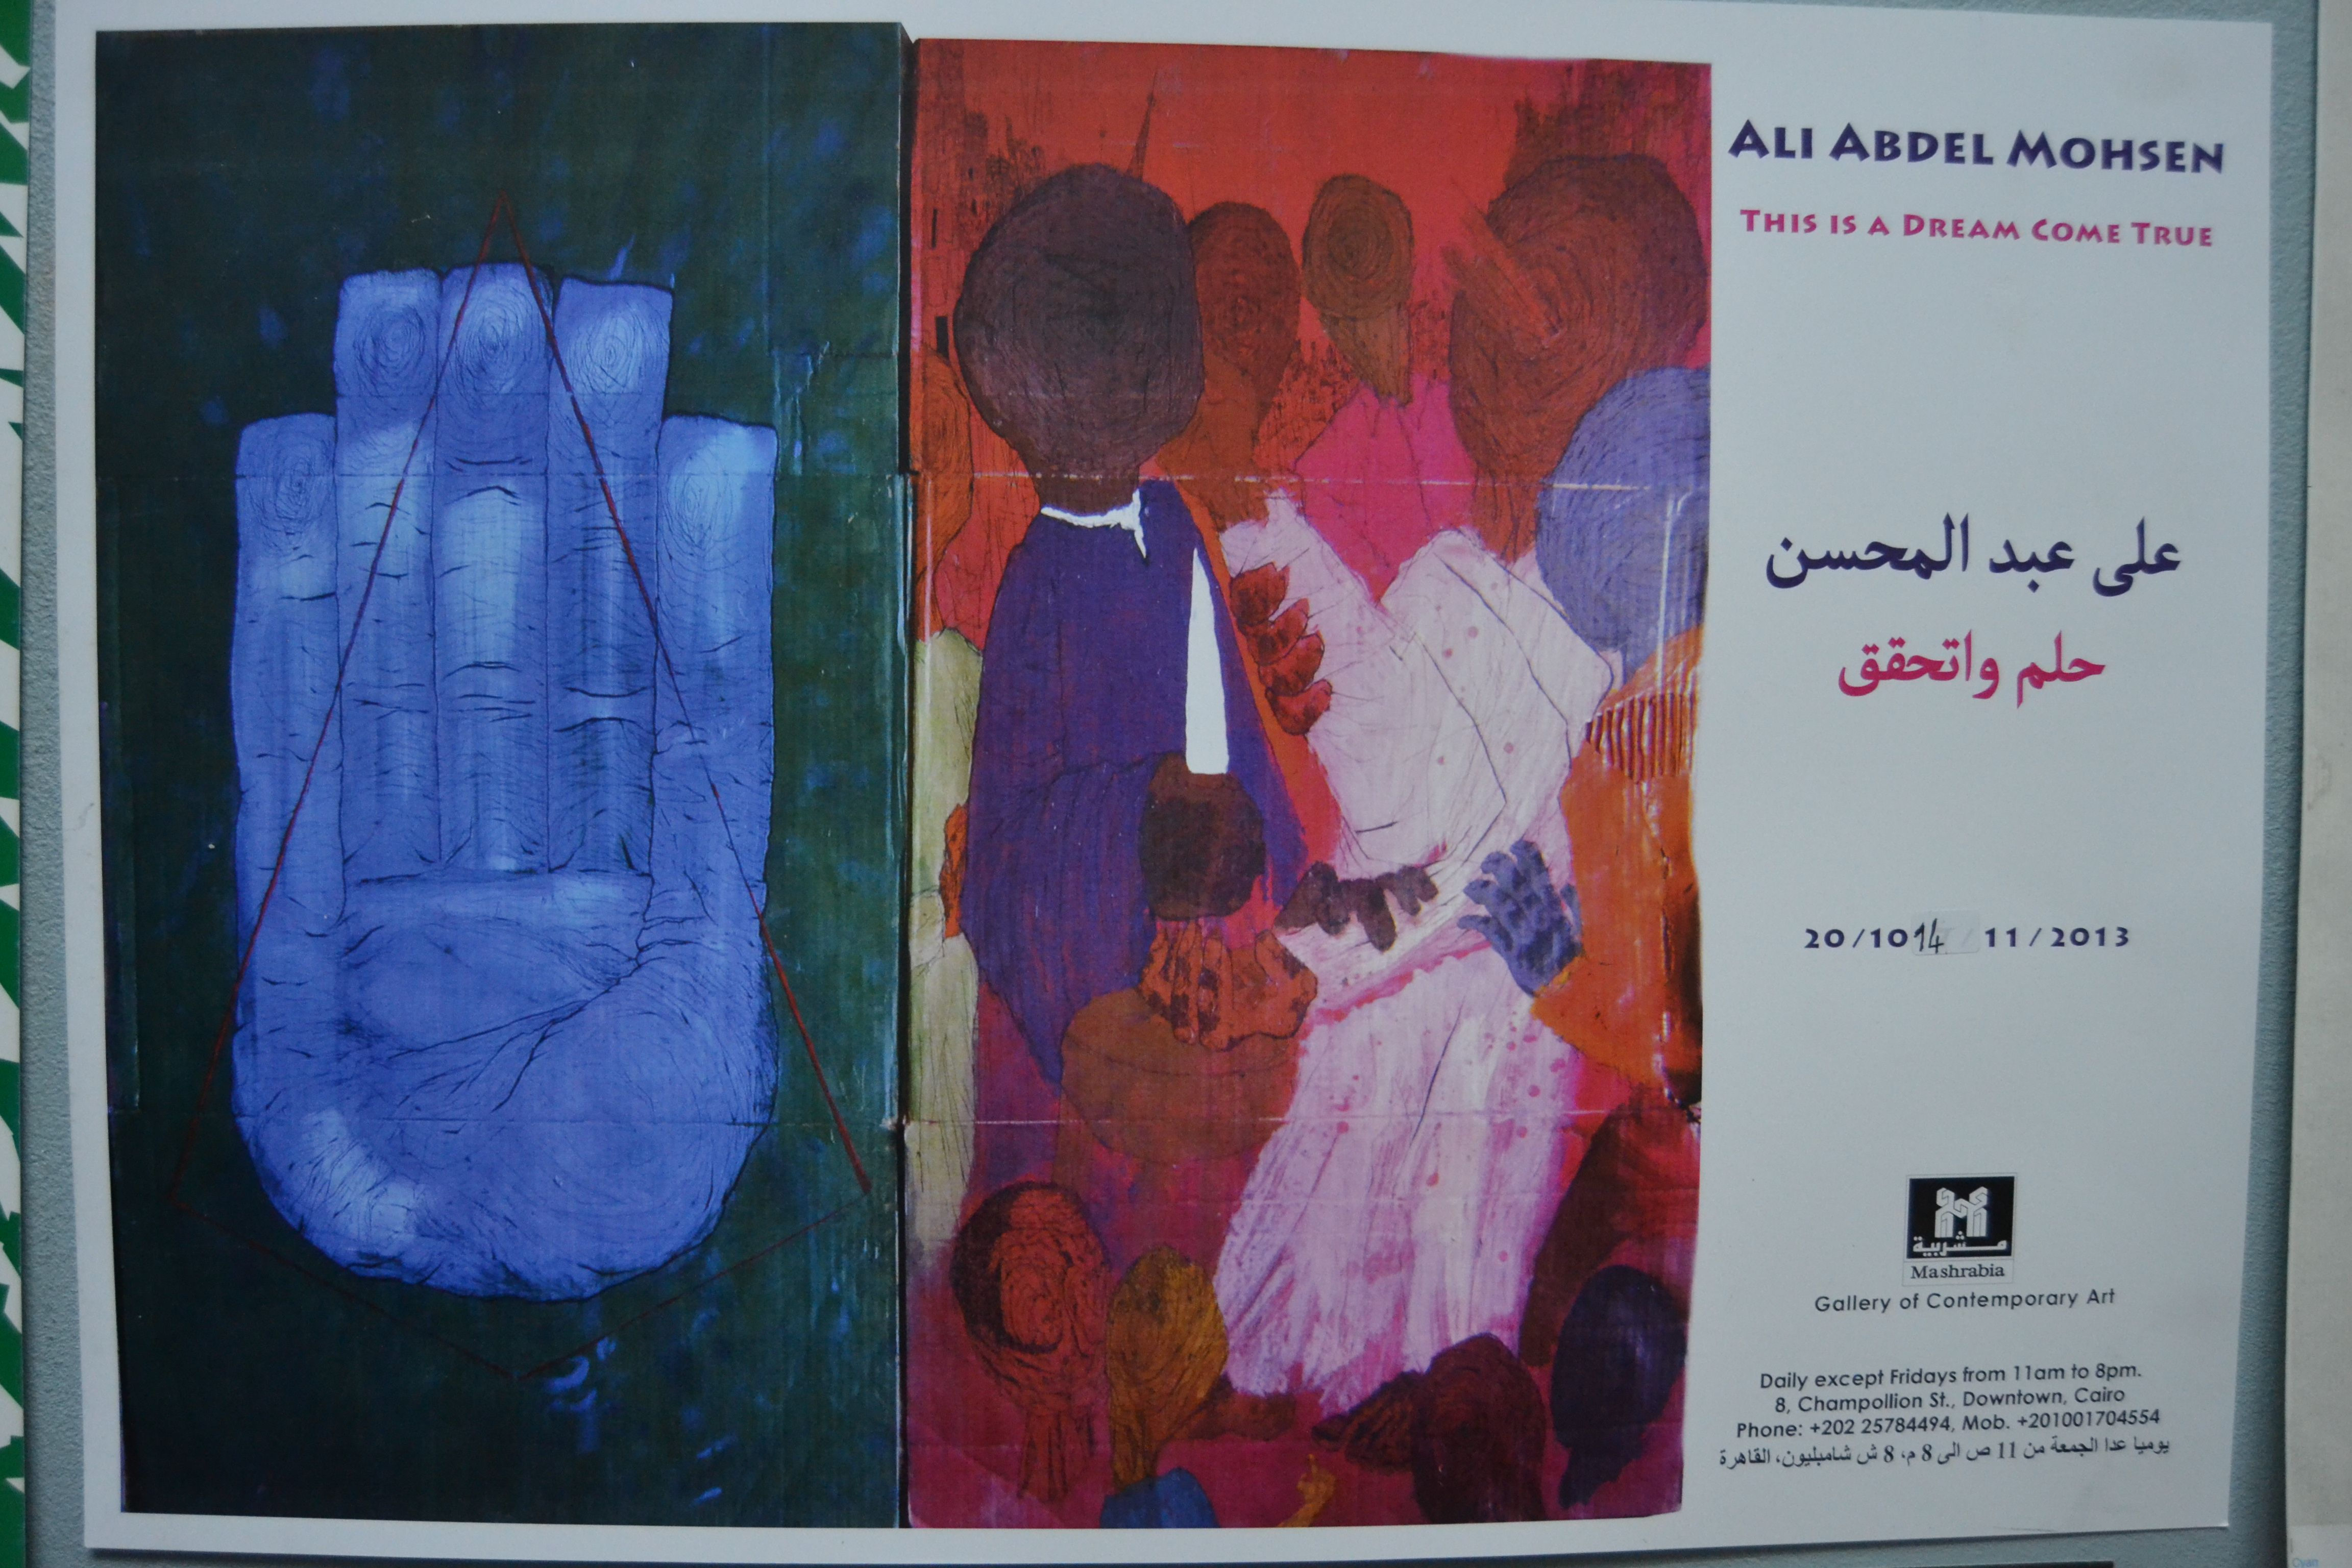 This is a Dream Come True by Ali Abdel Mohsen